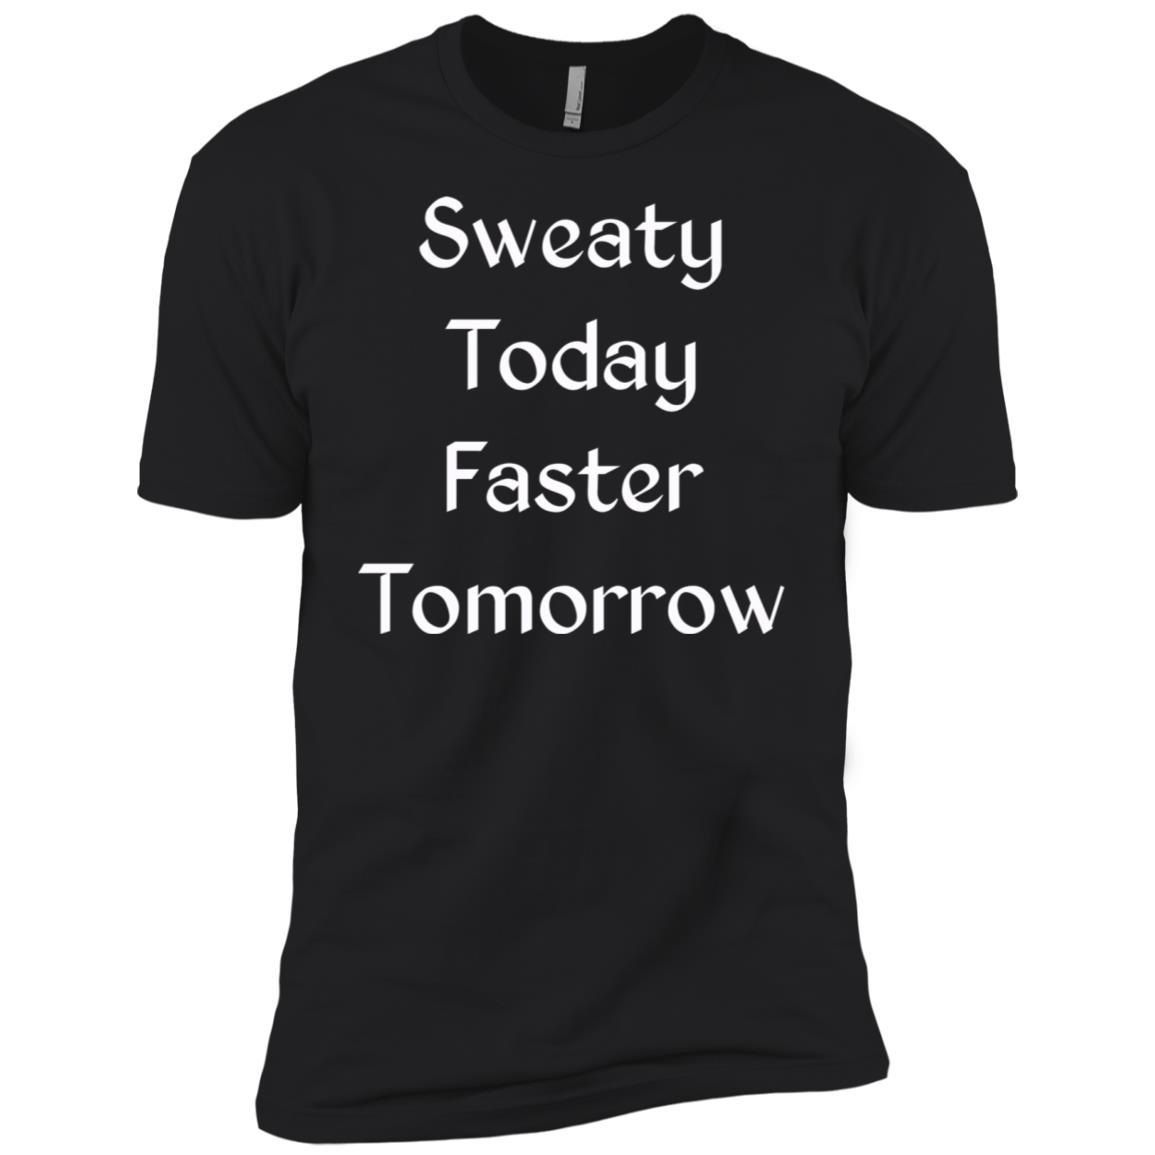 Sweaty Today Faster Tomorrow Running Men Short Sleeve T-Shirt